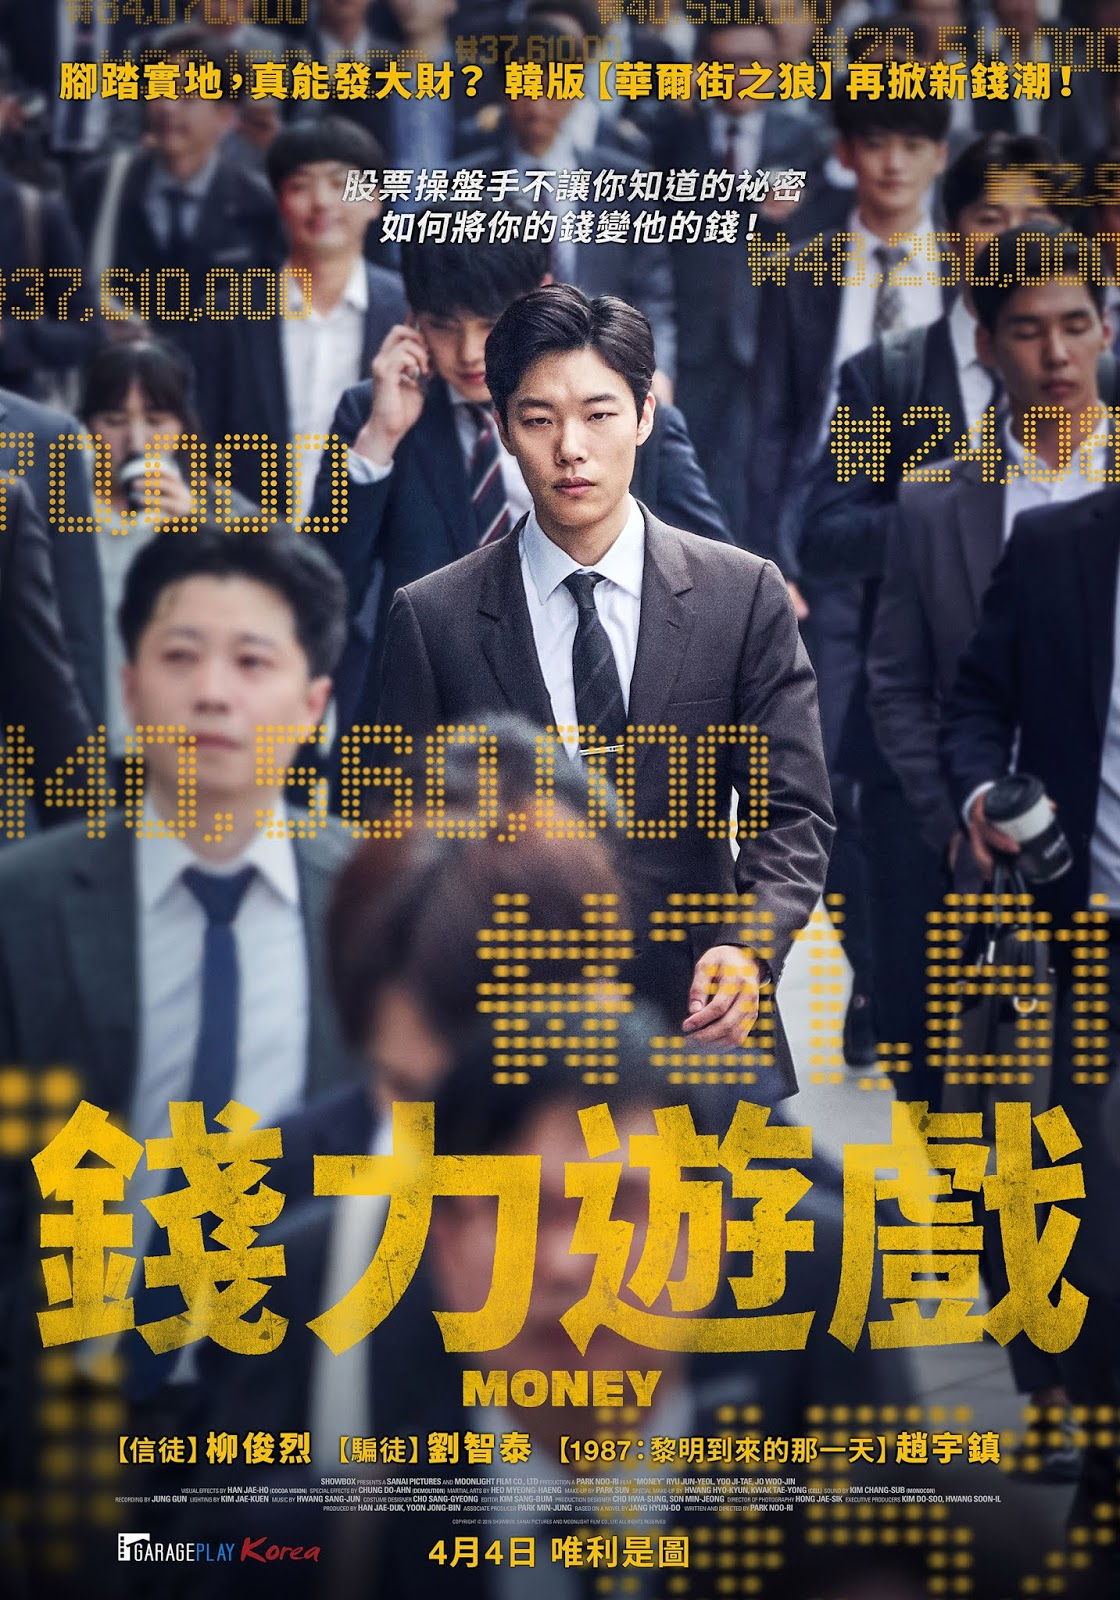 Adm廣告雜誌|Digital x Creative: 【電影分享】韓國電影都是真的!《錢力遊戲》大曝金融犯罪內幕 原來這些人都做過